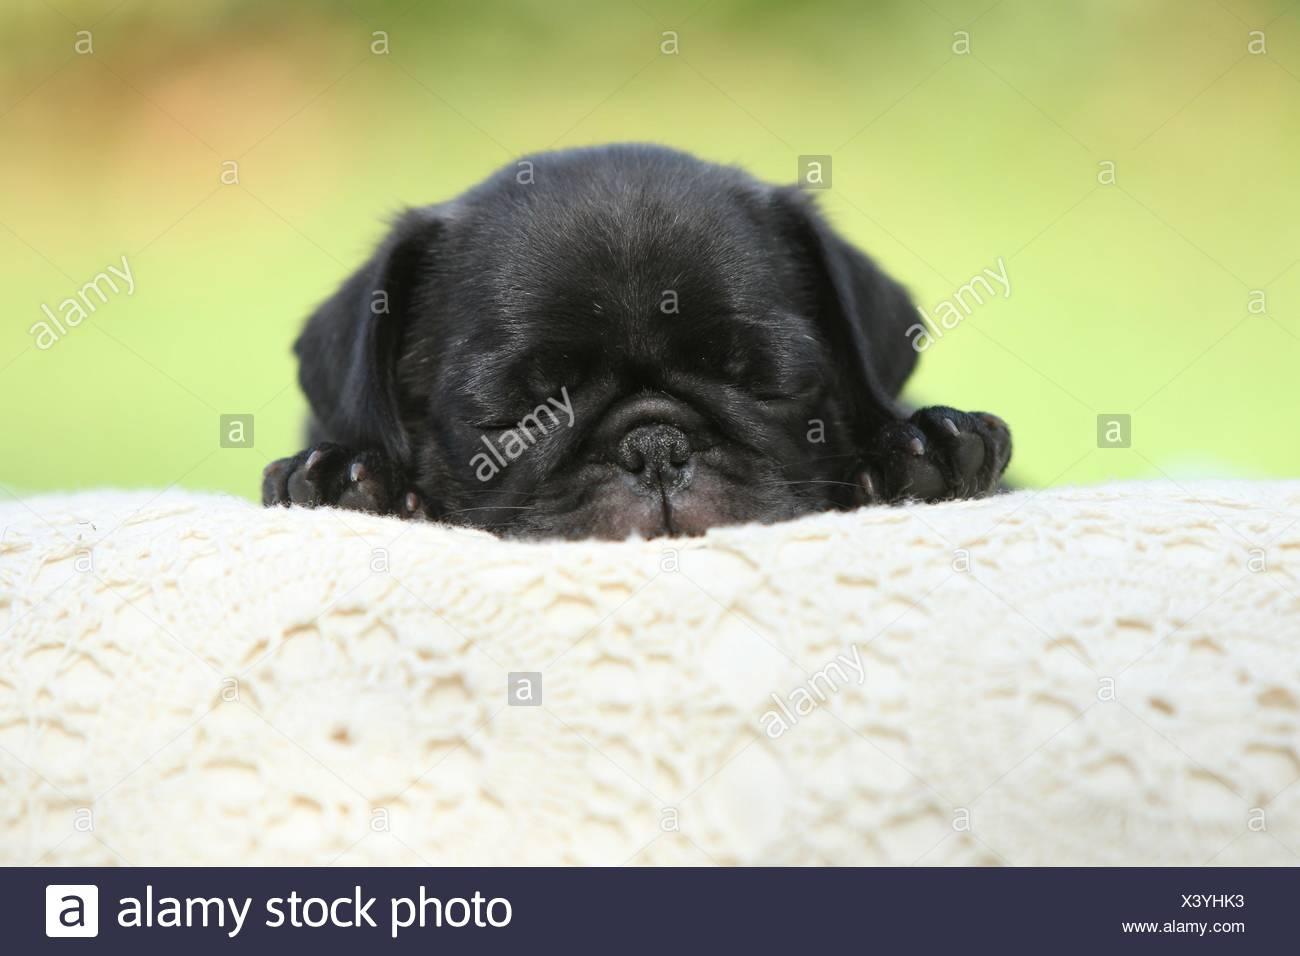 pug puppy - Stock Image